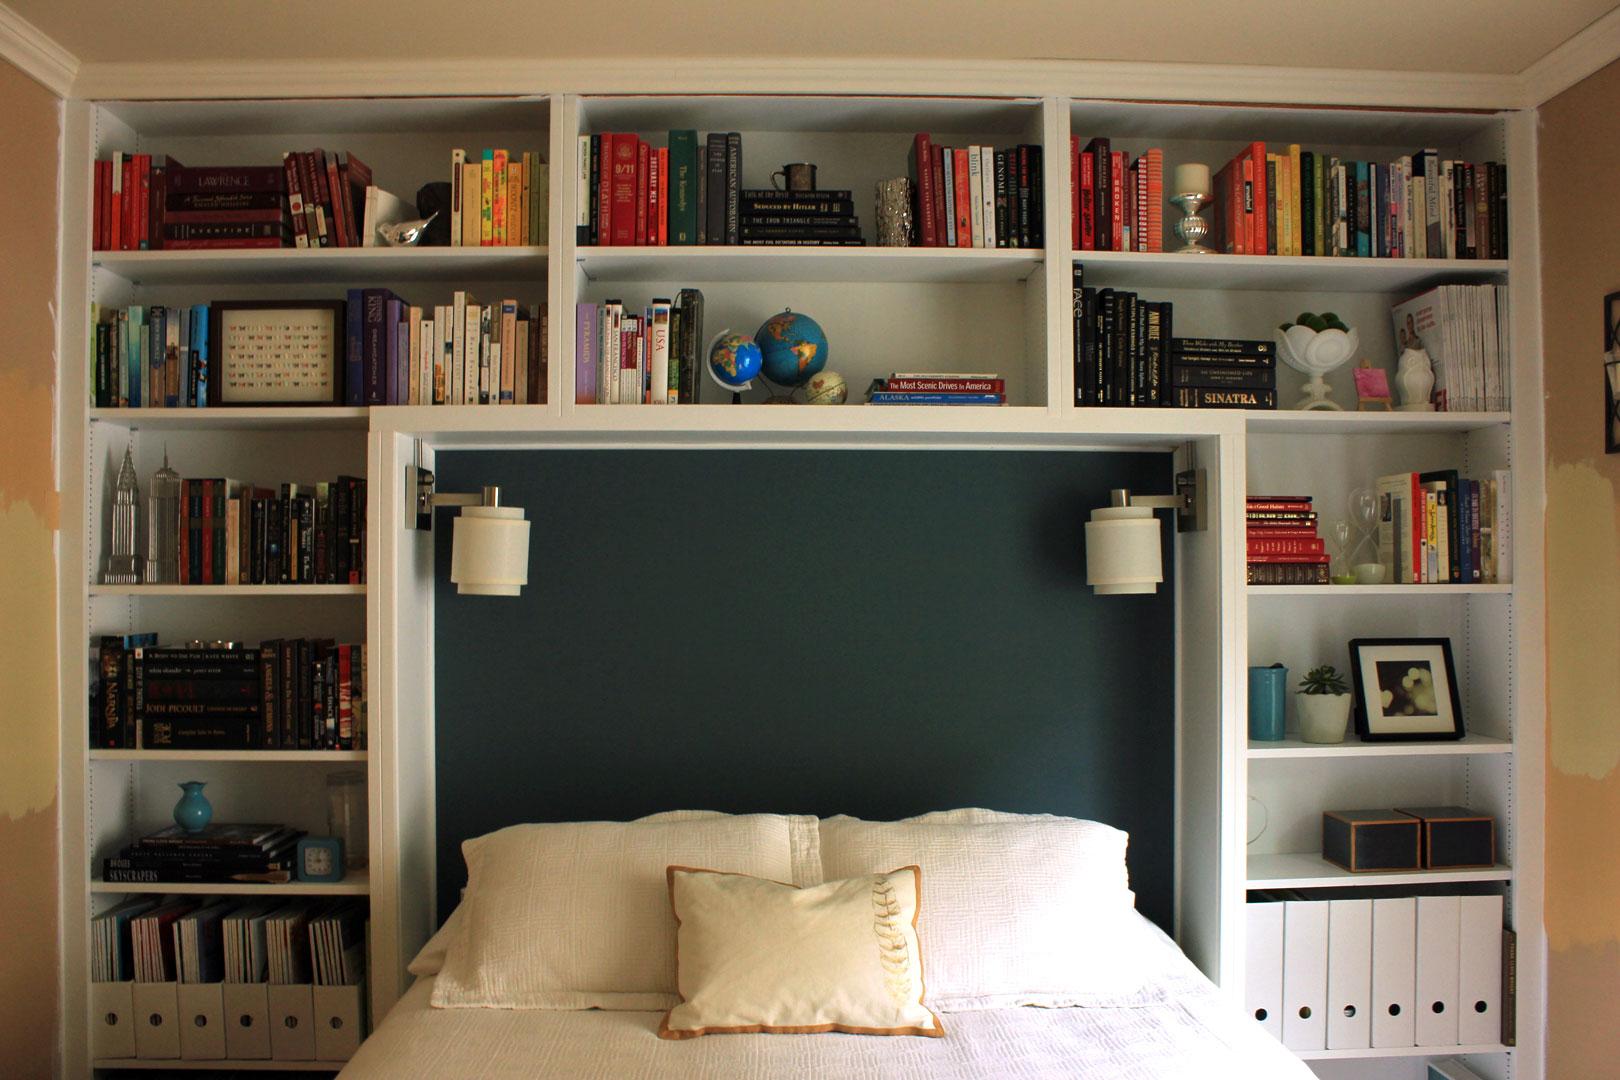 How To Make A Bookshelf Headboard Plans Diy Free Download Pergola Instructions To Build Woodwork Restoration